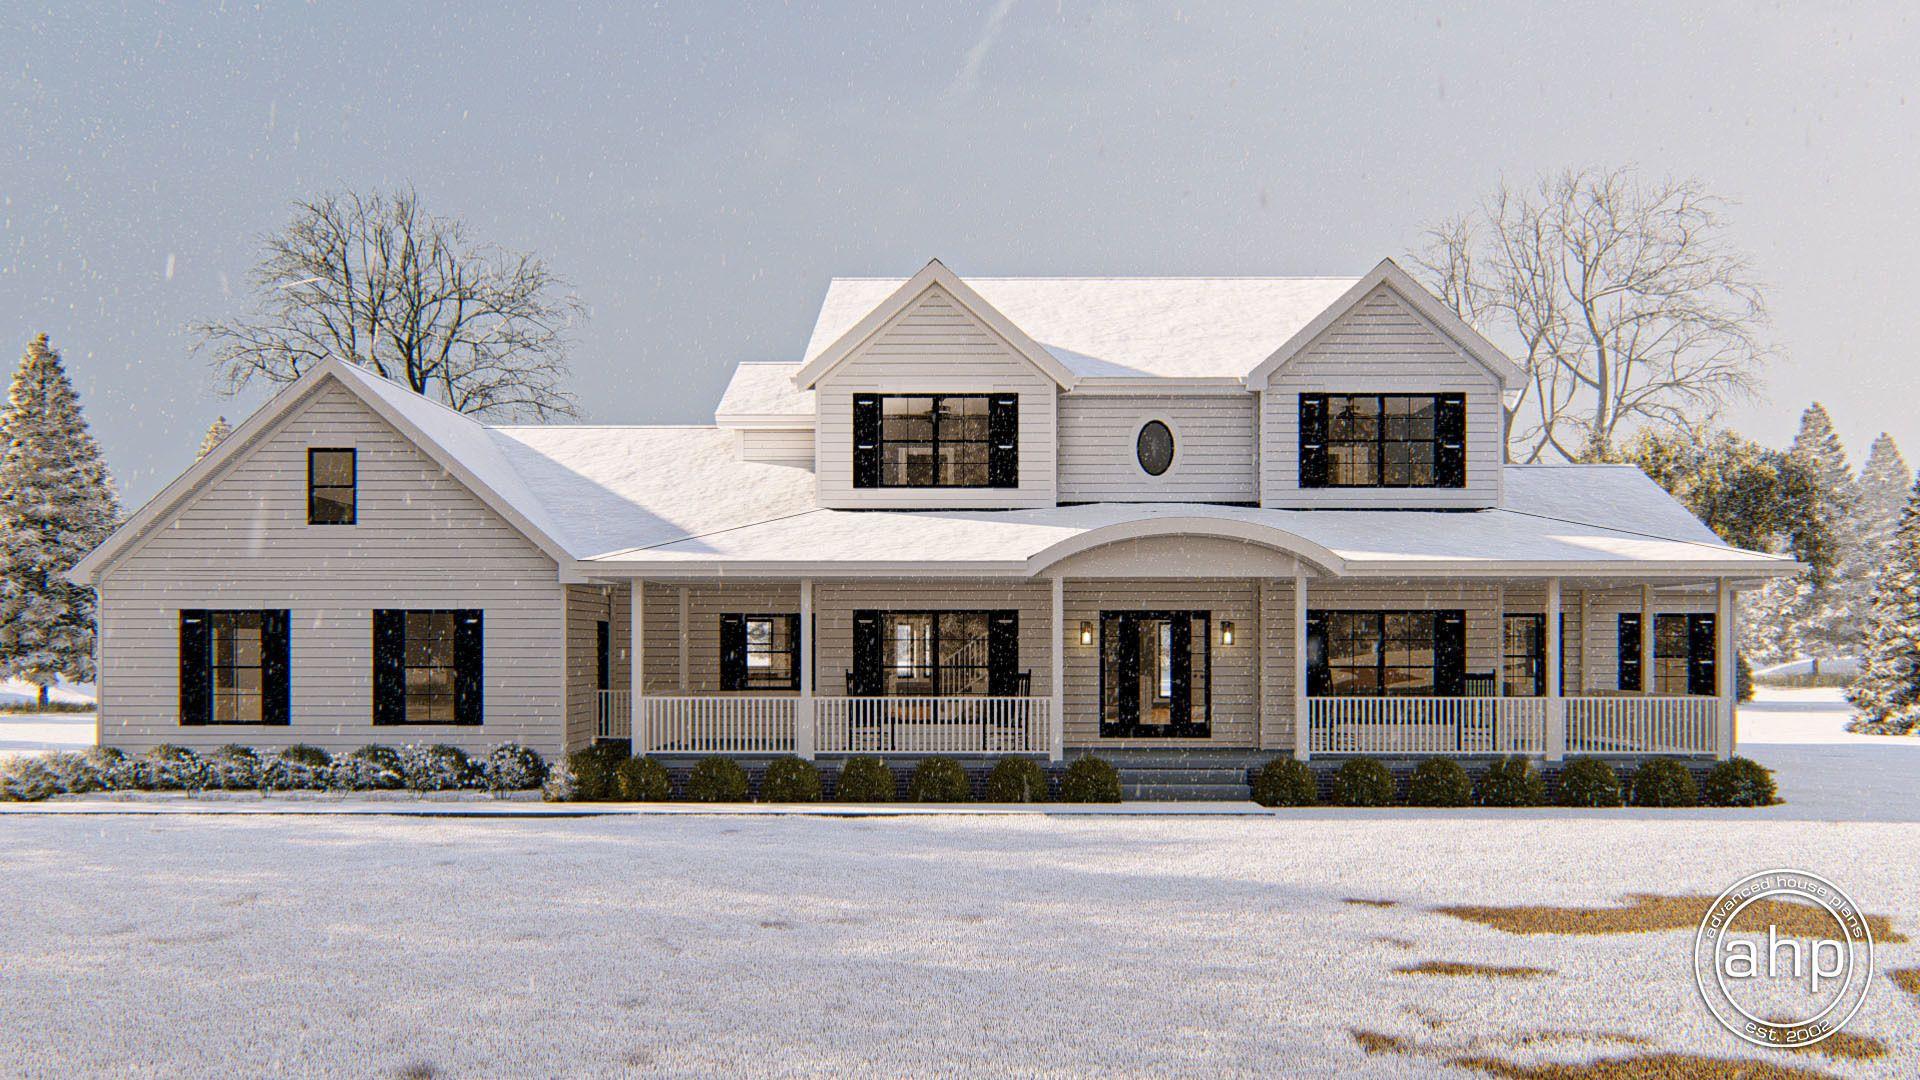 Strattfield 1.5 Story Modern Farmhouse House Plan